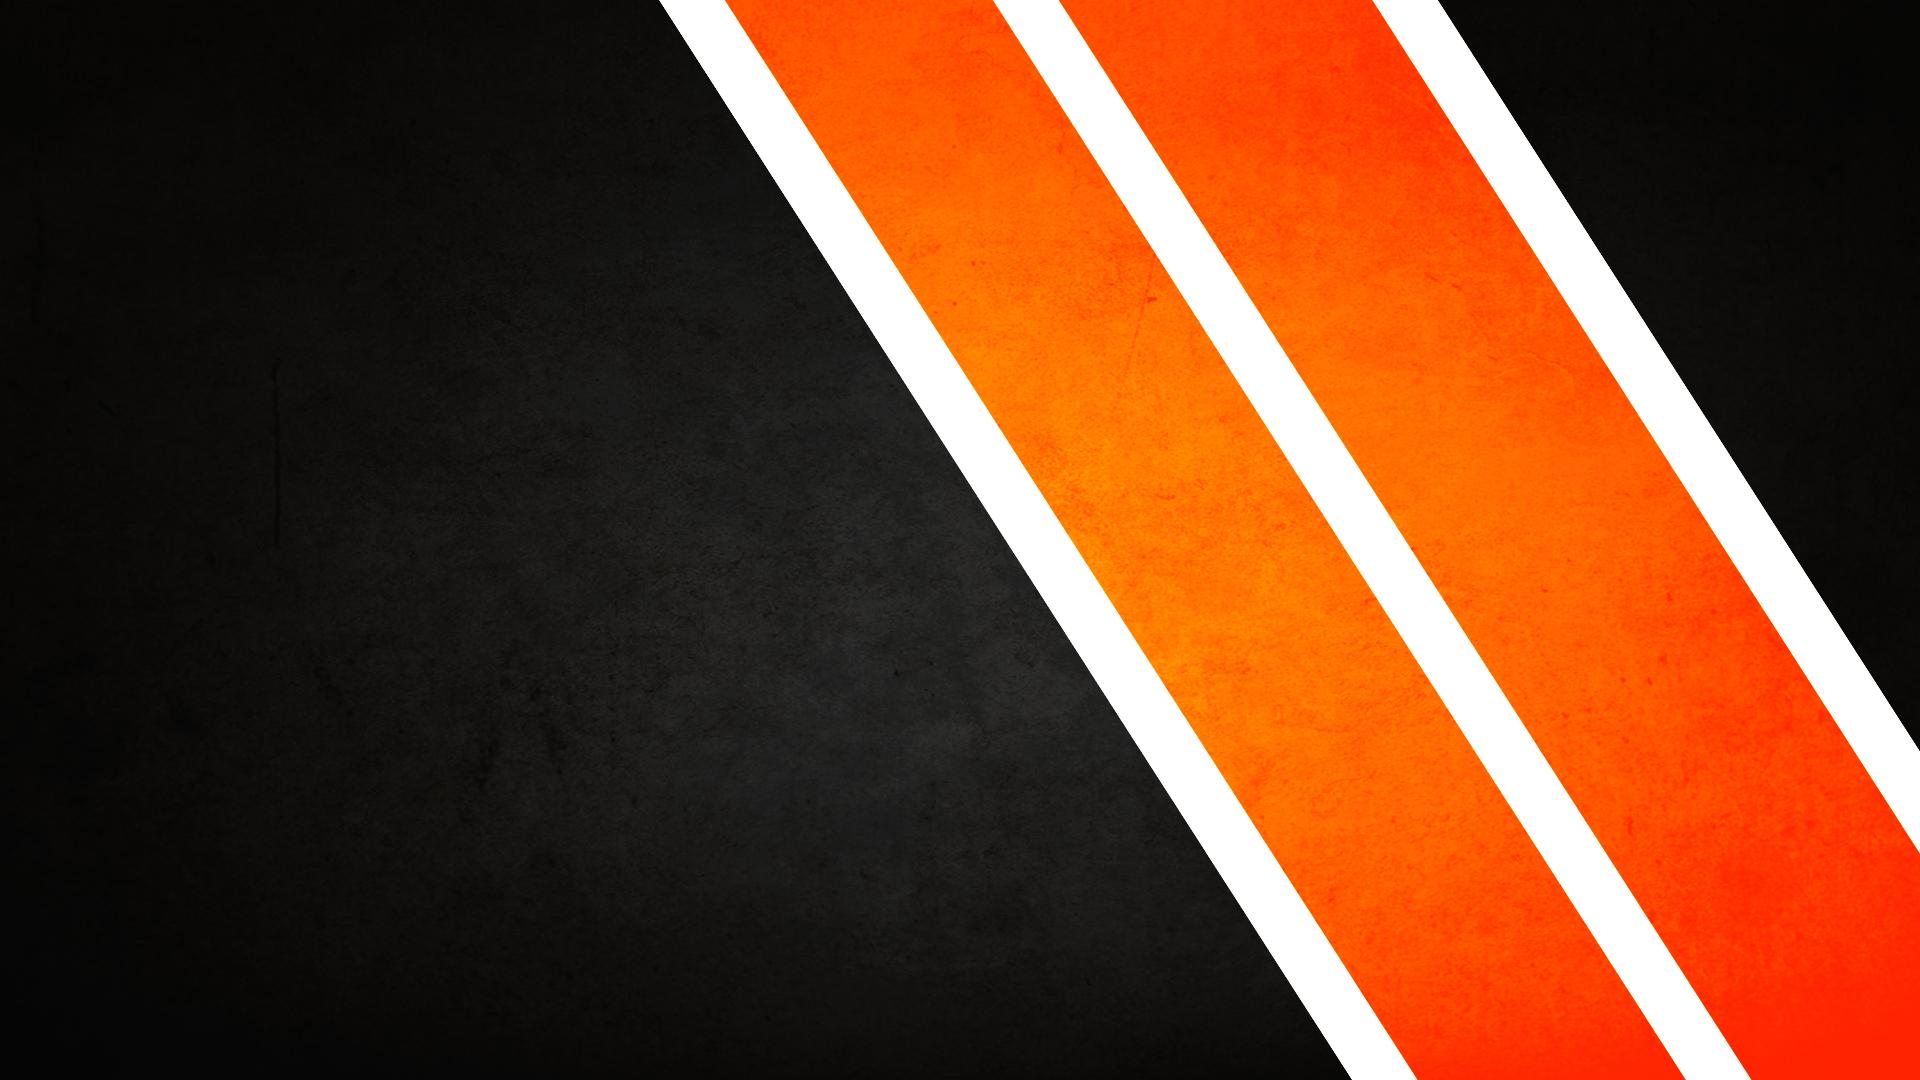 Orange Grunge Stripes   Nexus Wallpaper 1920x1080